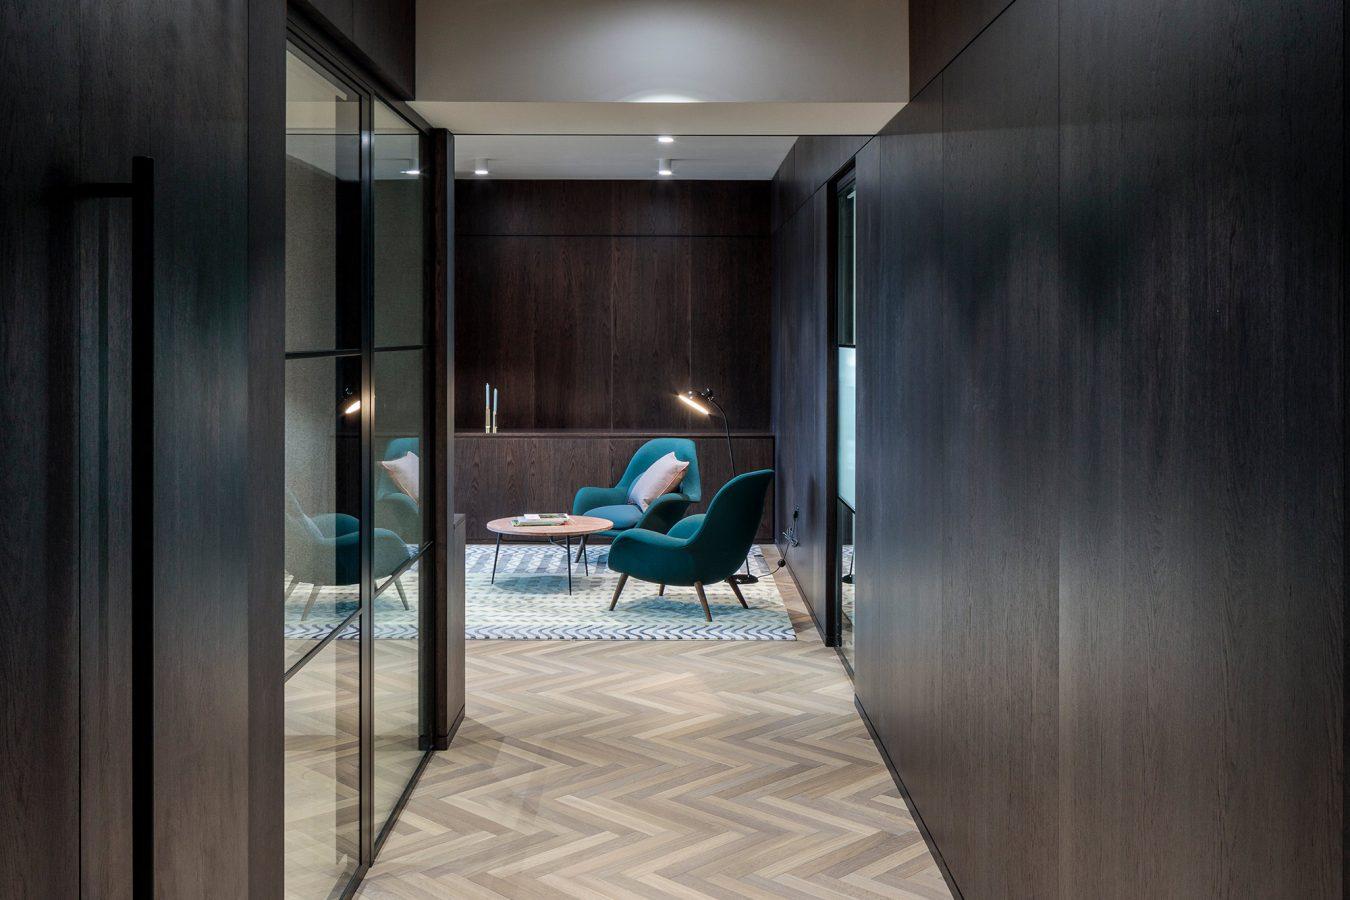 Herringbone parquet floor tiles in an office, in London.